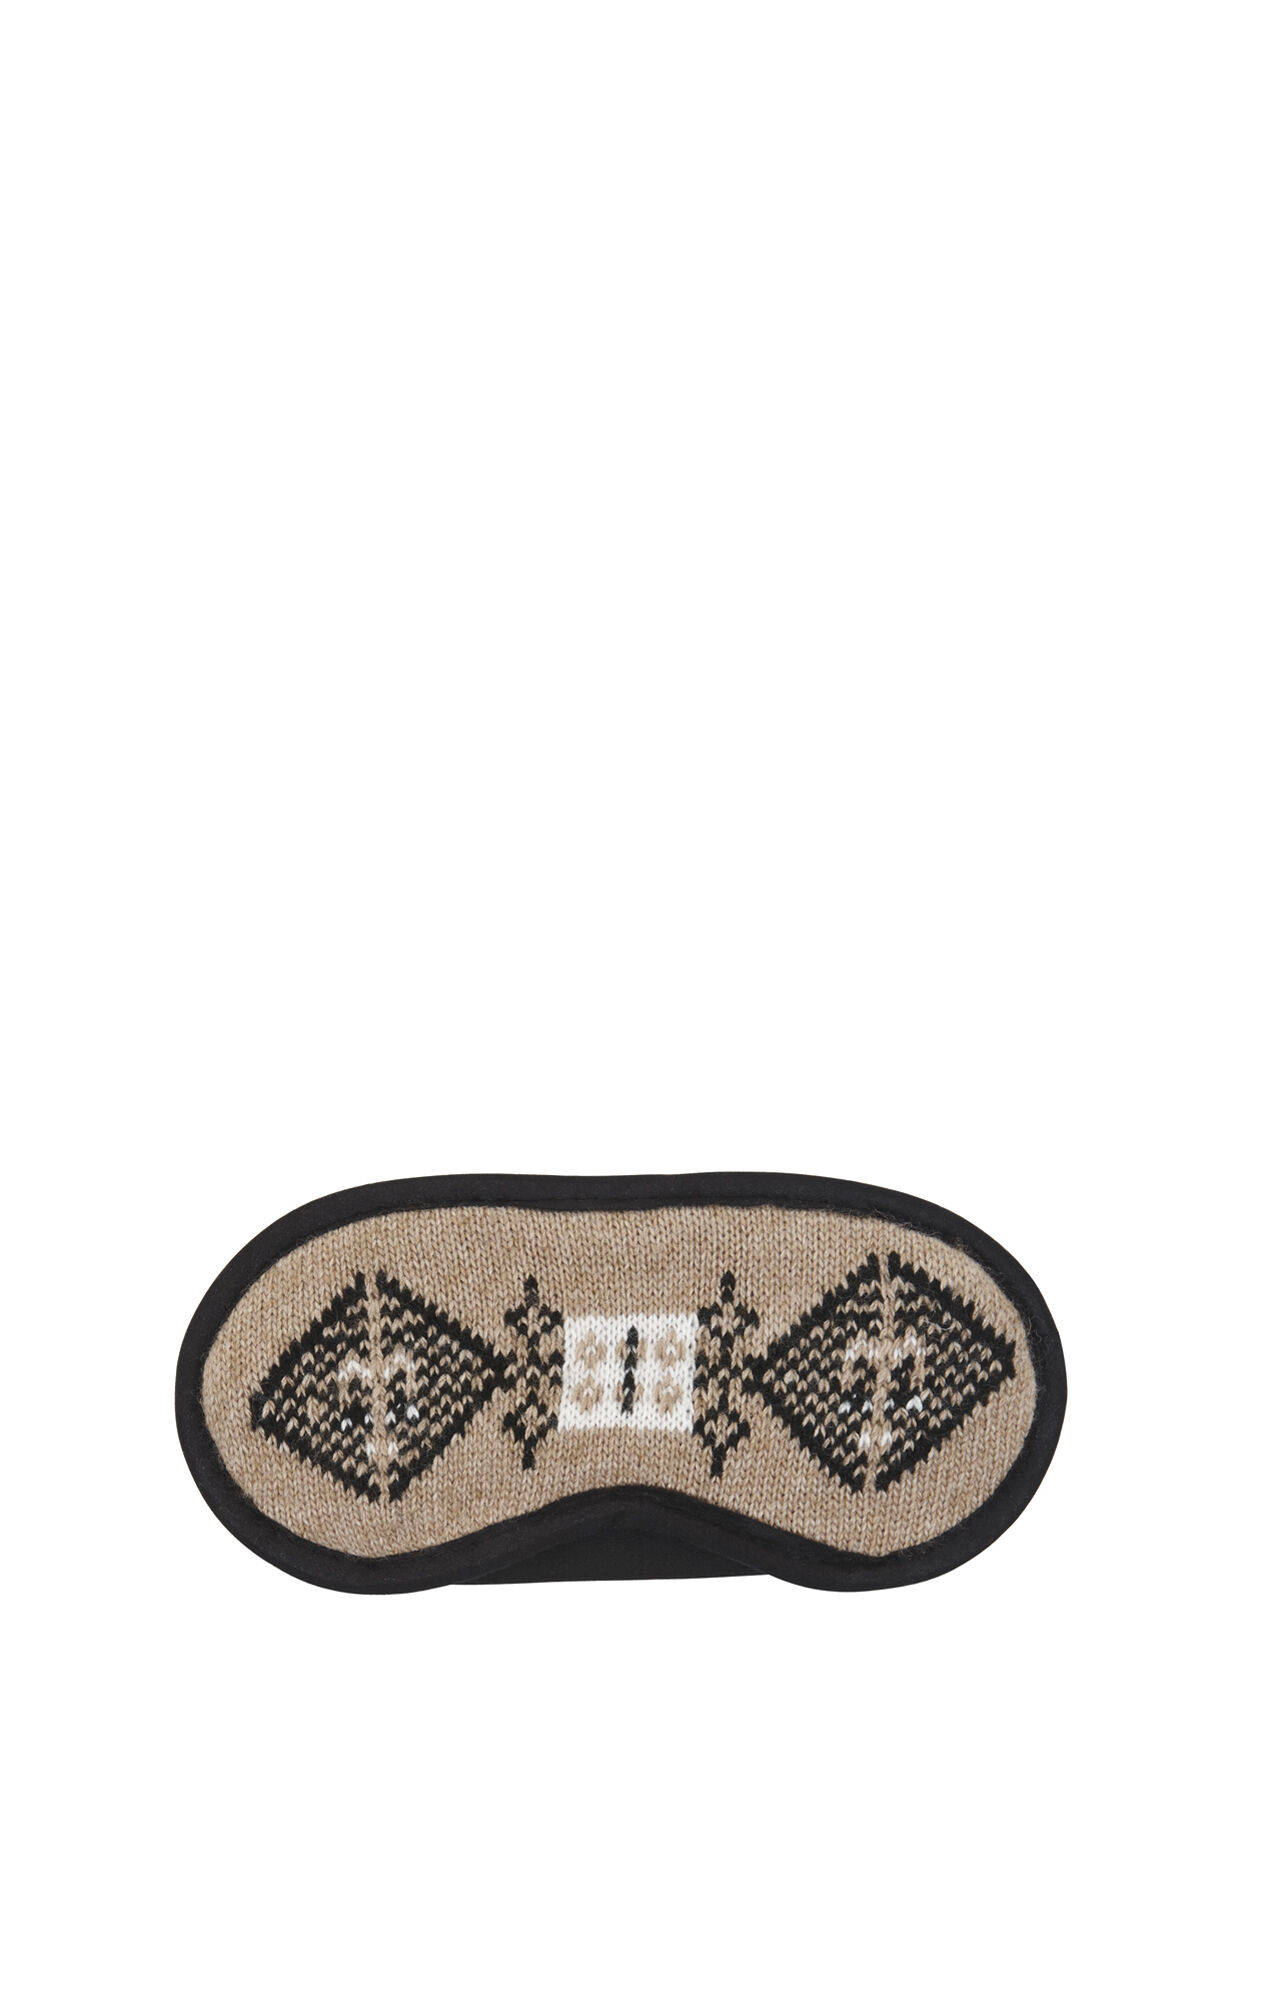 Jacquard Pillow, Eye Mask and Scarf Set